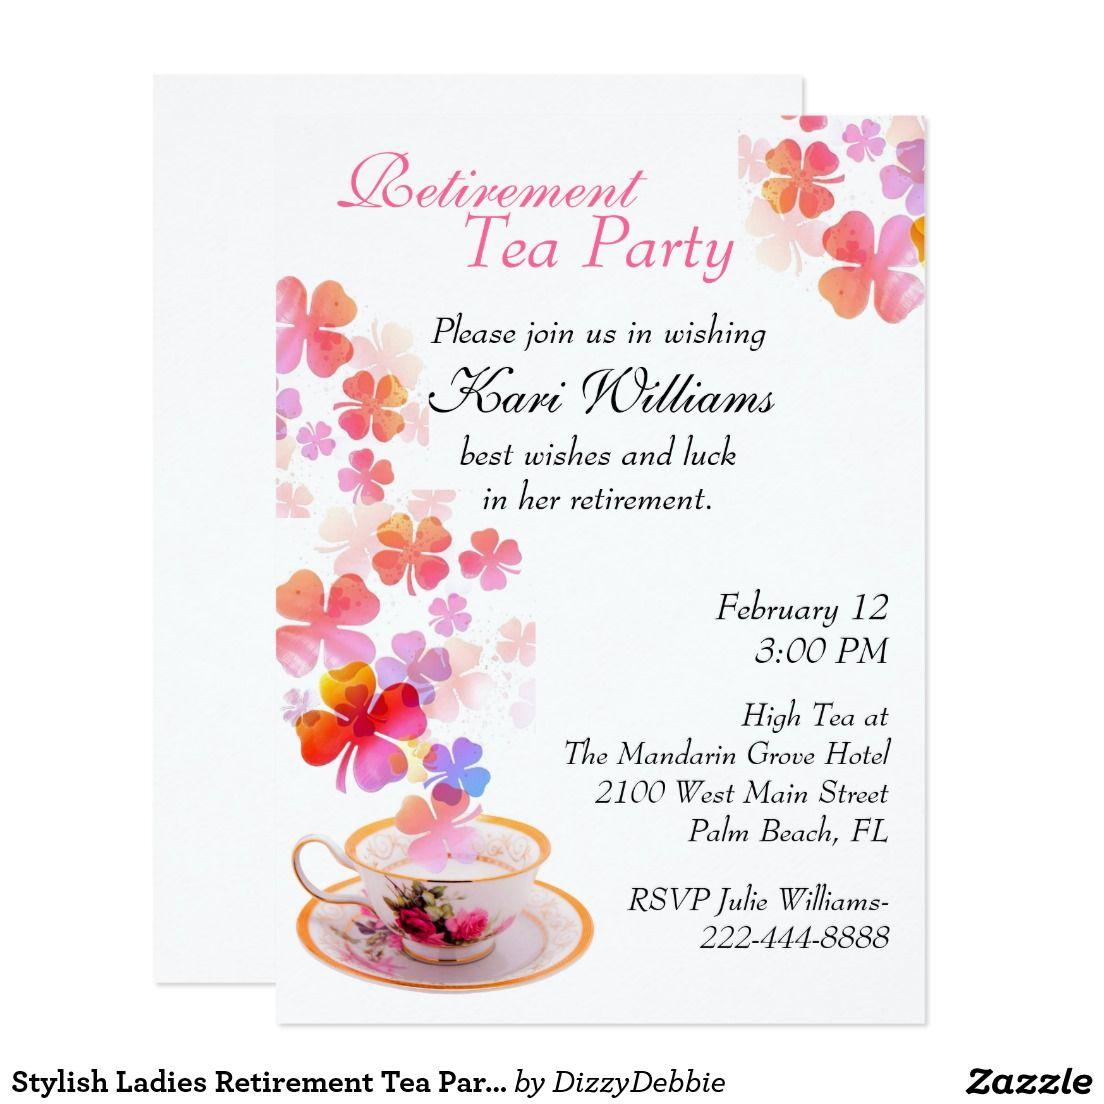 Stylish ladies retirement tea party invitation tea party stylish ladies retirement tea party invitation monicamarmolfo Image collections